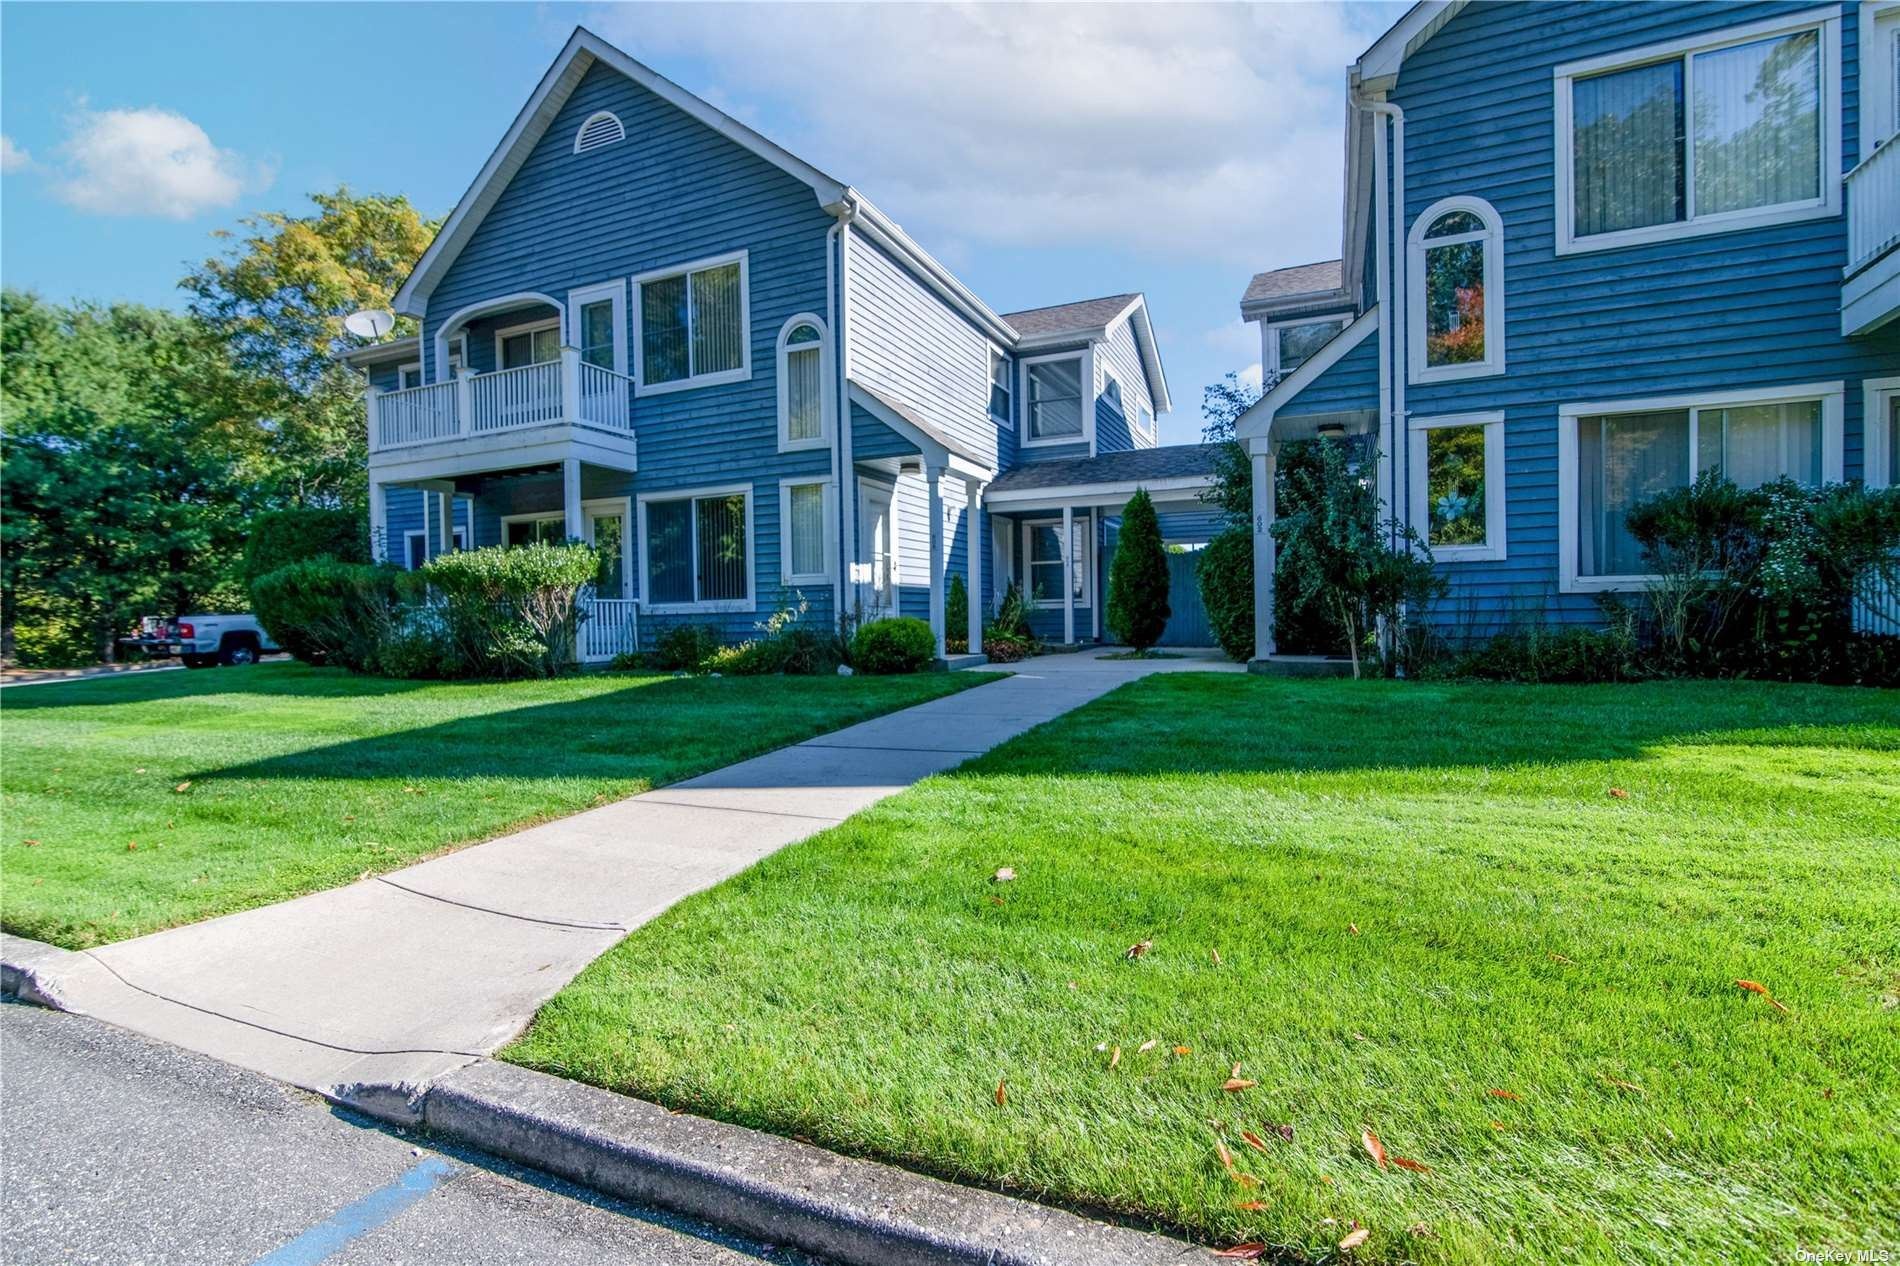 604 Birchwood Park Drive #604, Middle Island, NY 11953 - MLS#: 3325624